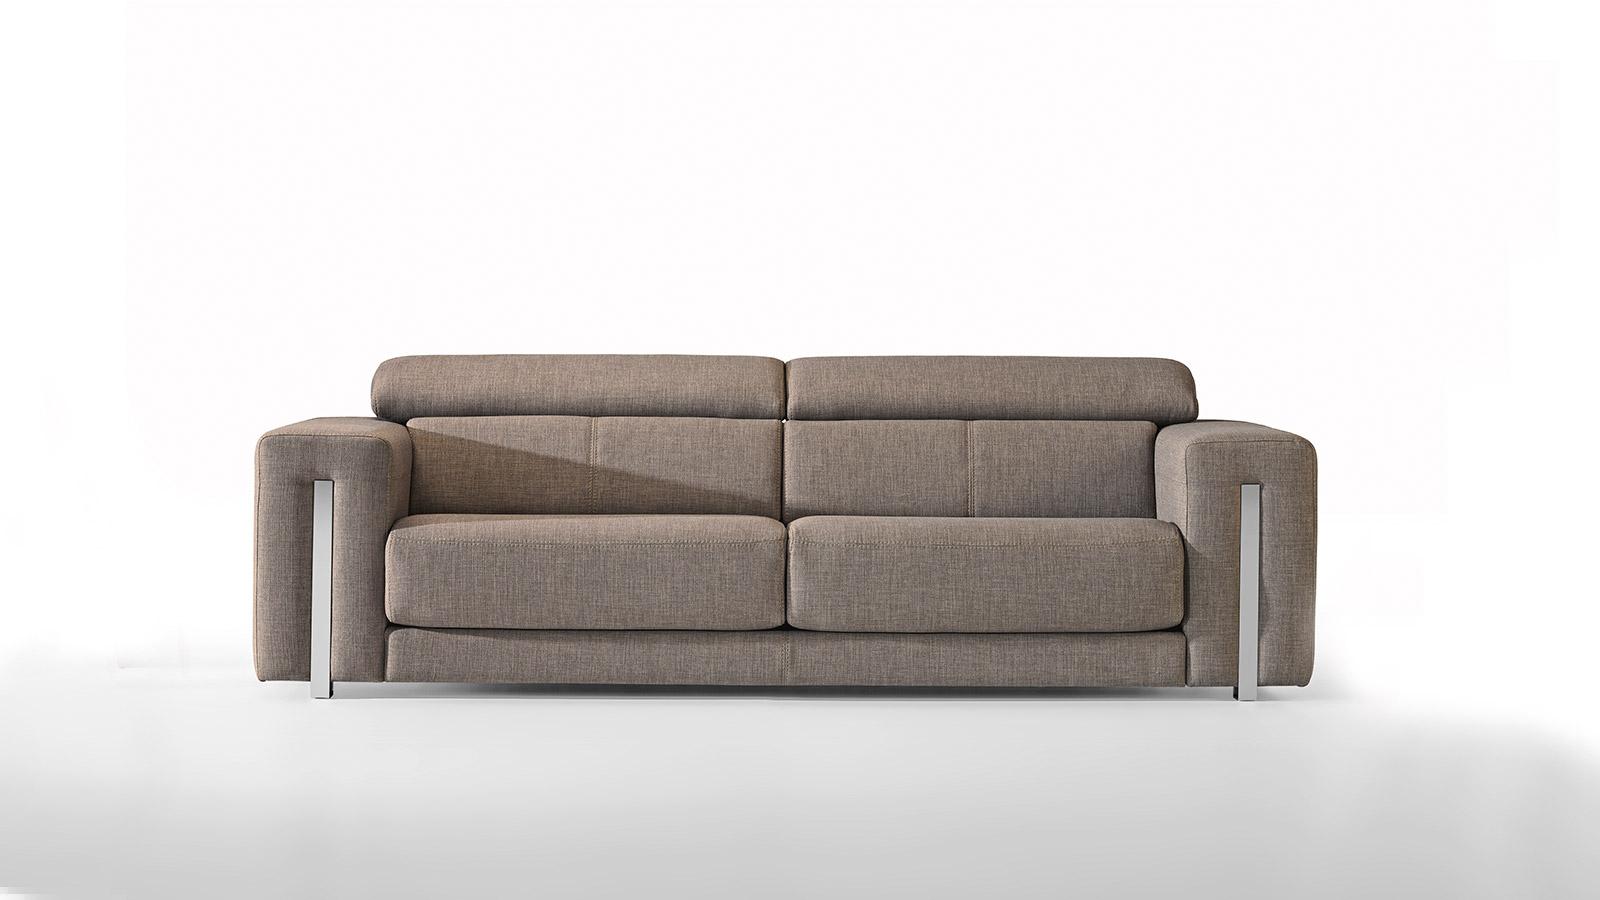 Sofas divatto 201419 revista muebles mobiliario de dise o for Sofas divatto outlet